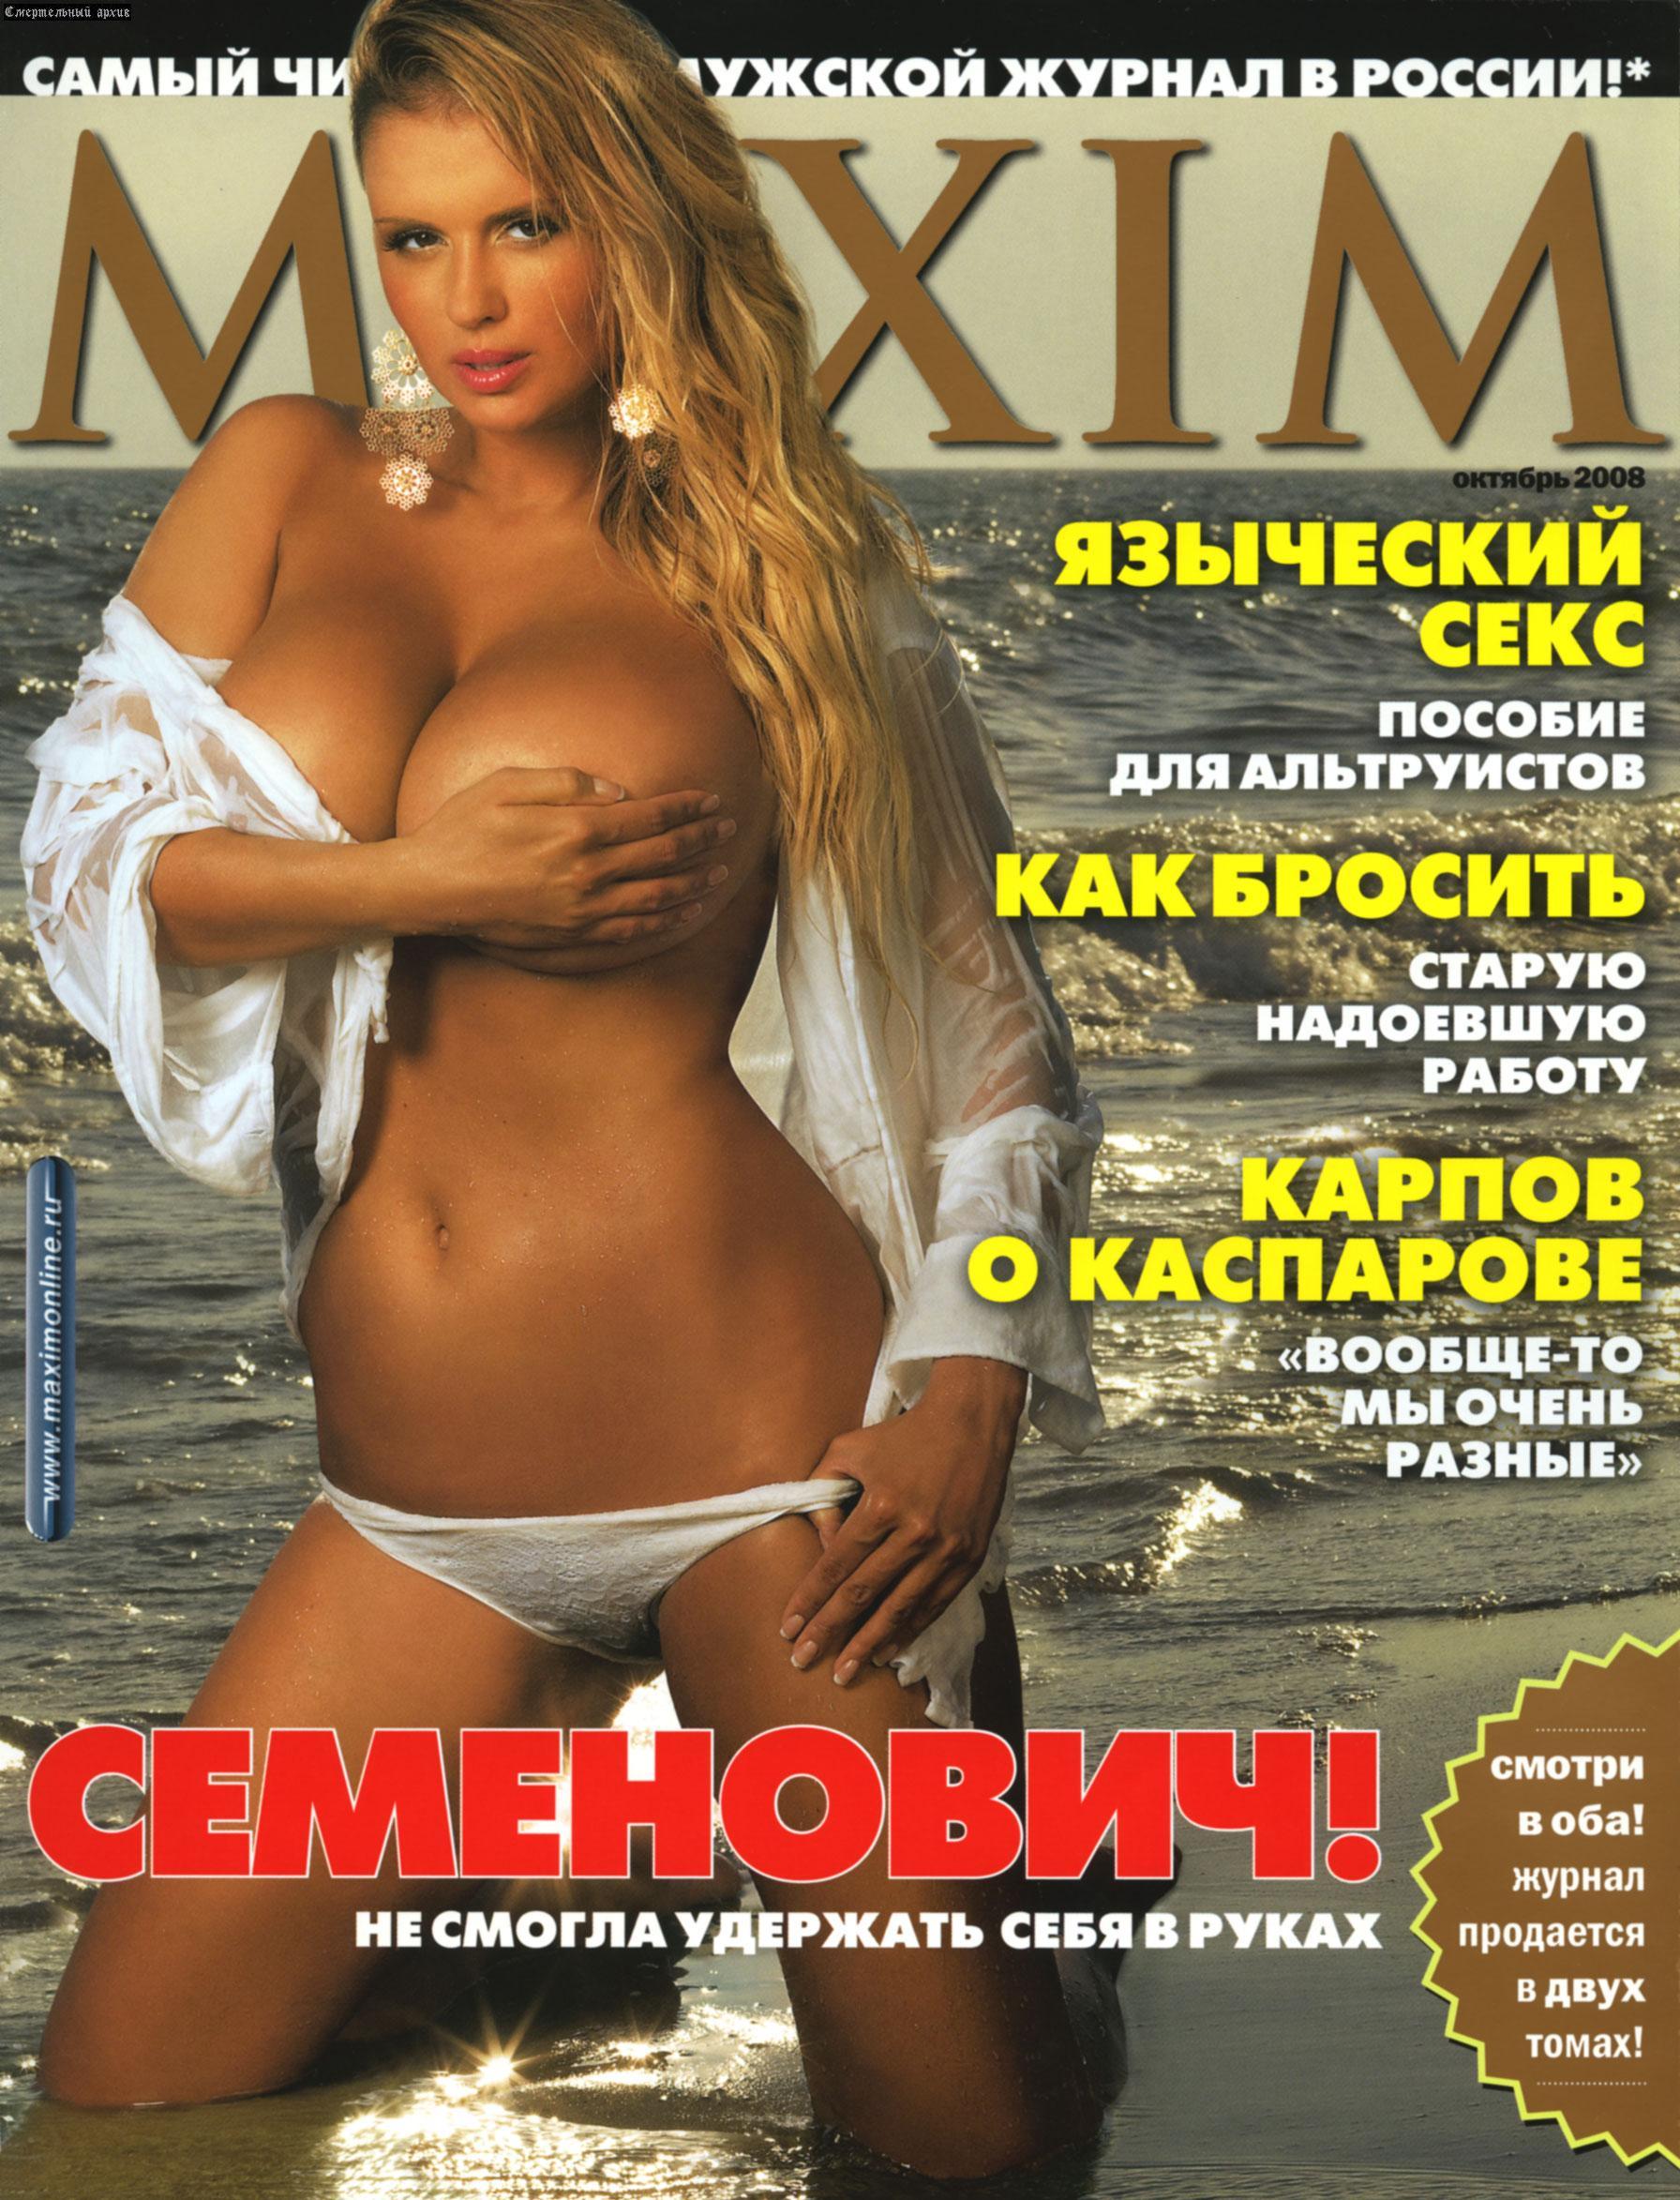 Голая Анна Семенович Xcadr